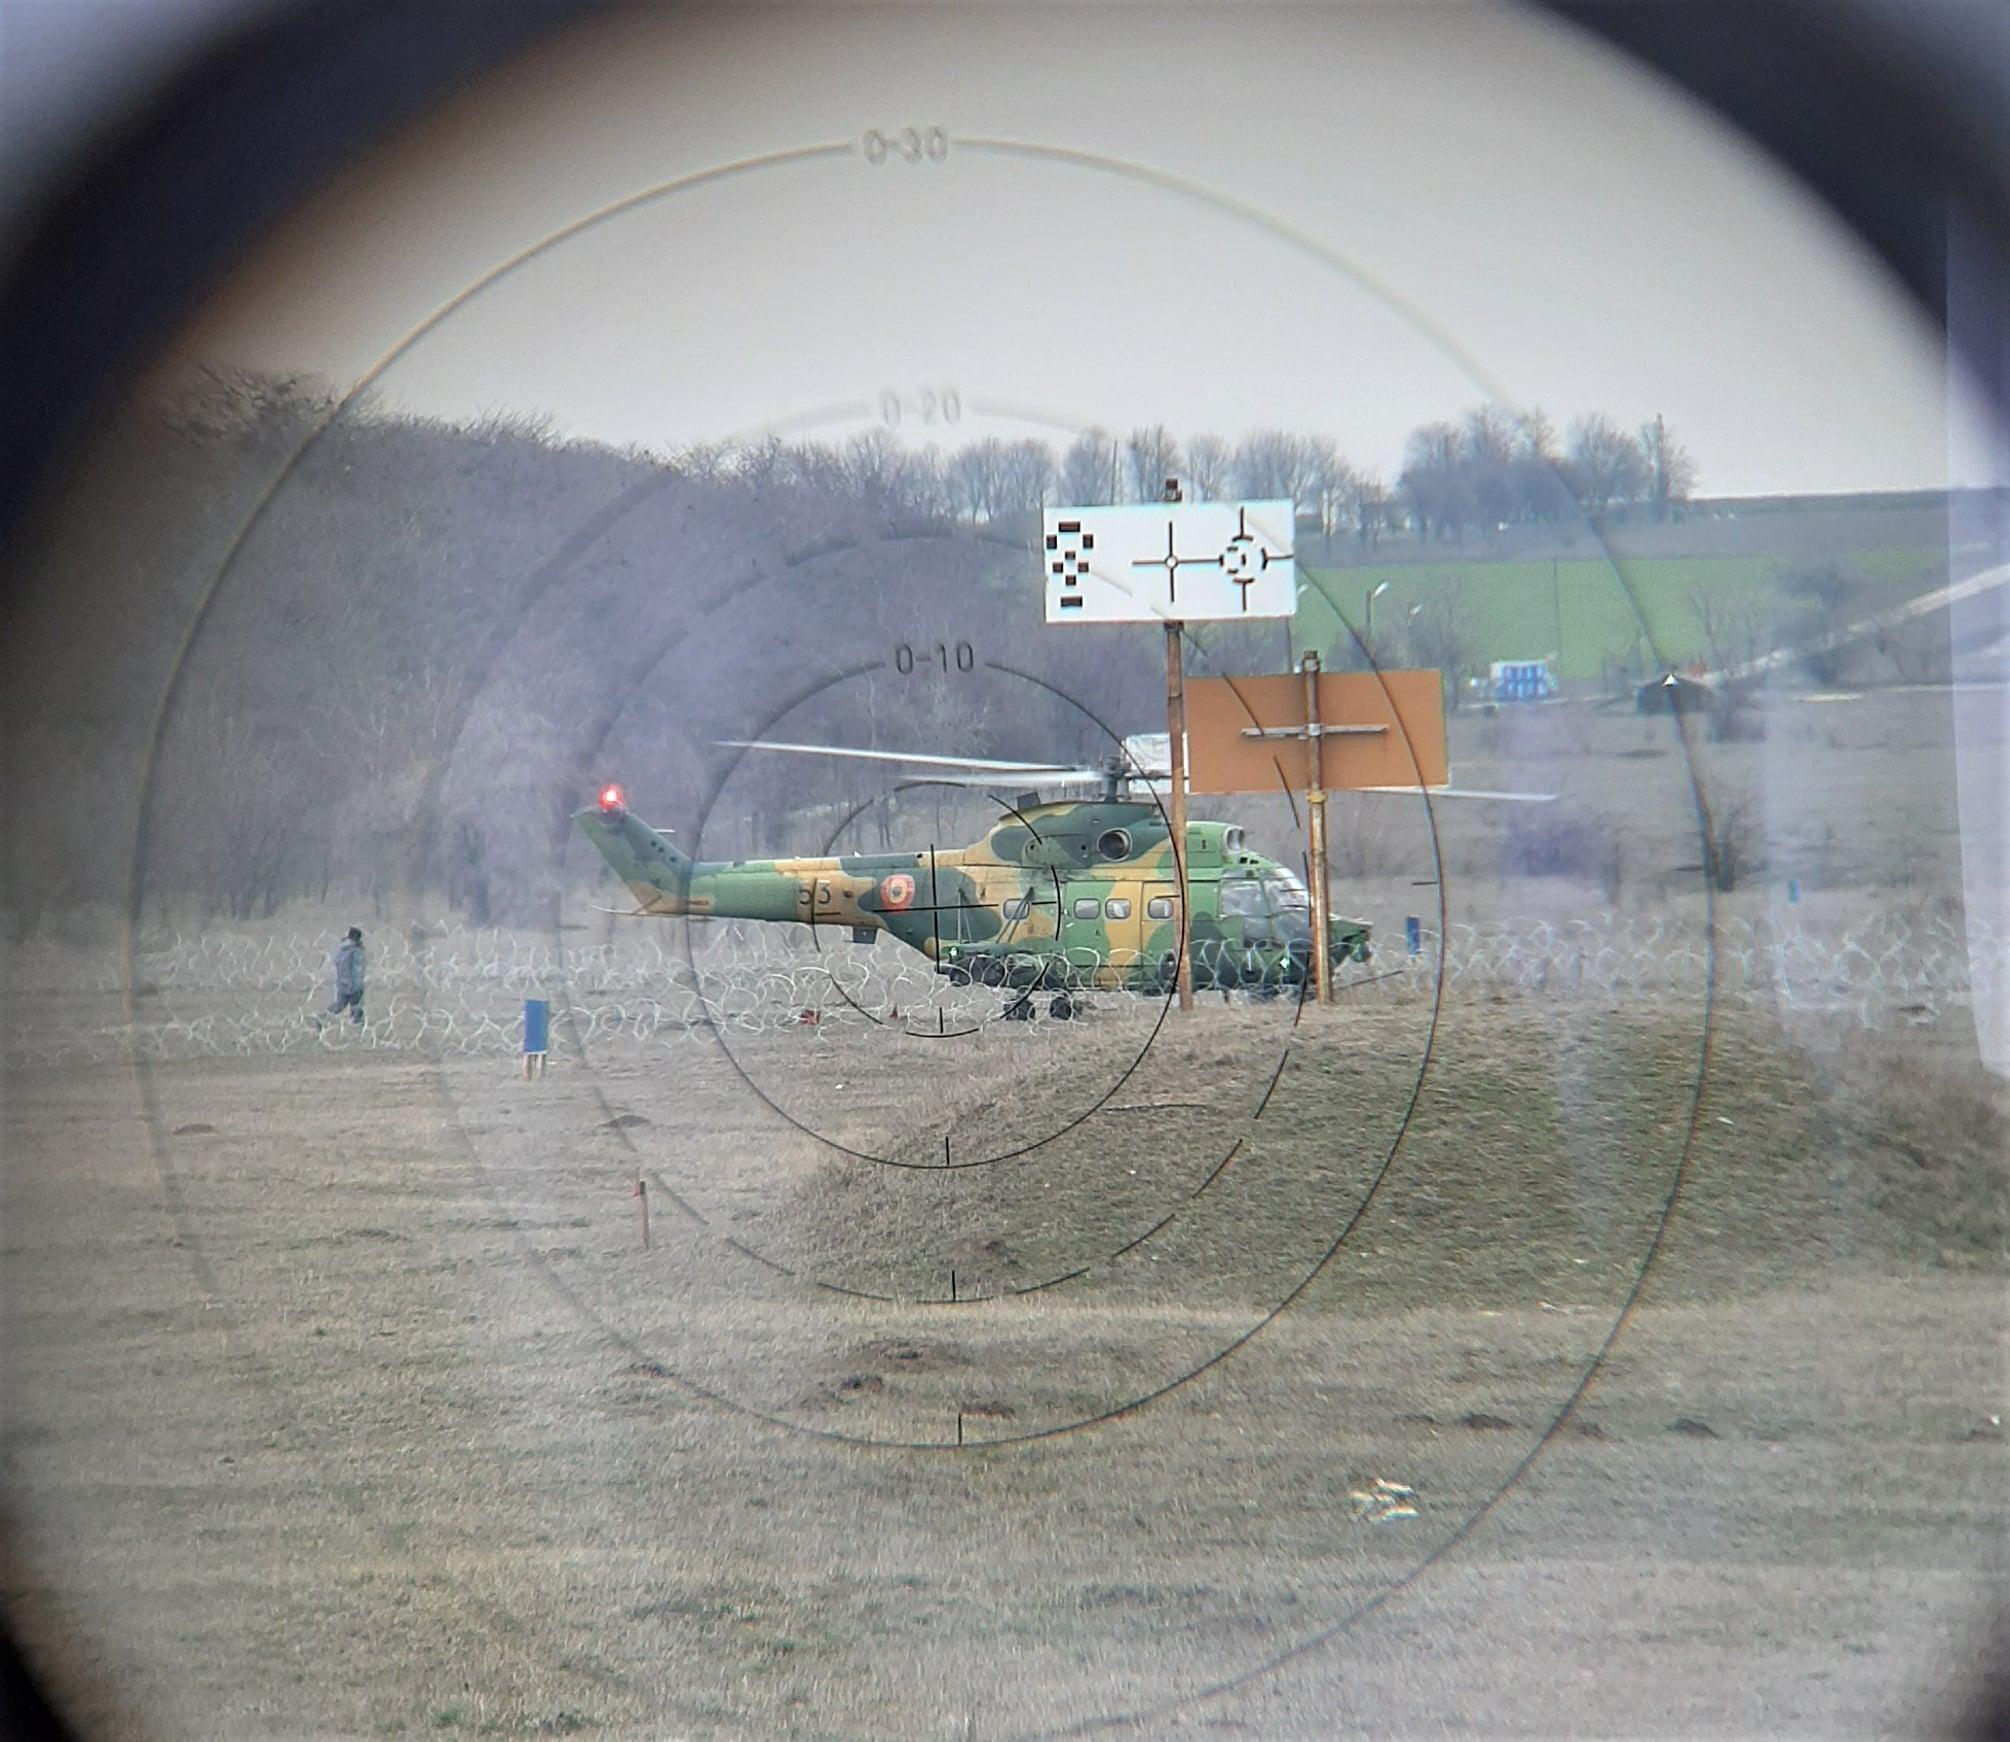 racheta tinta antitanc fortele aeriene1